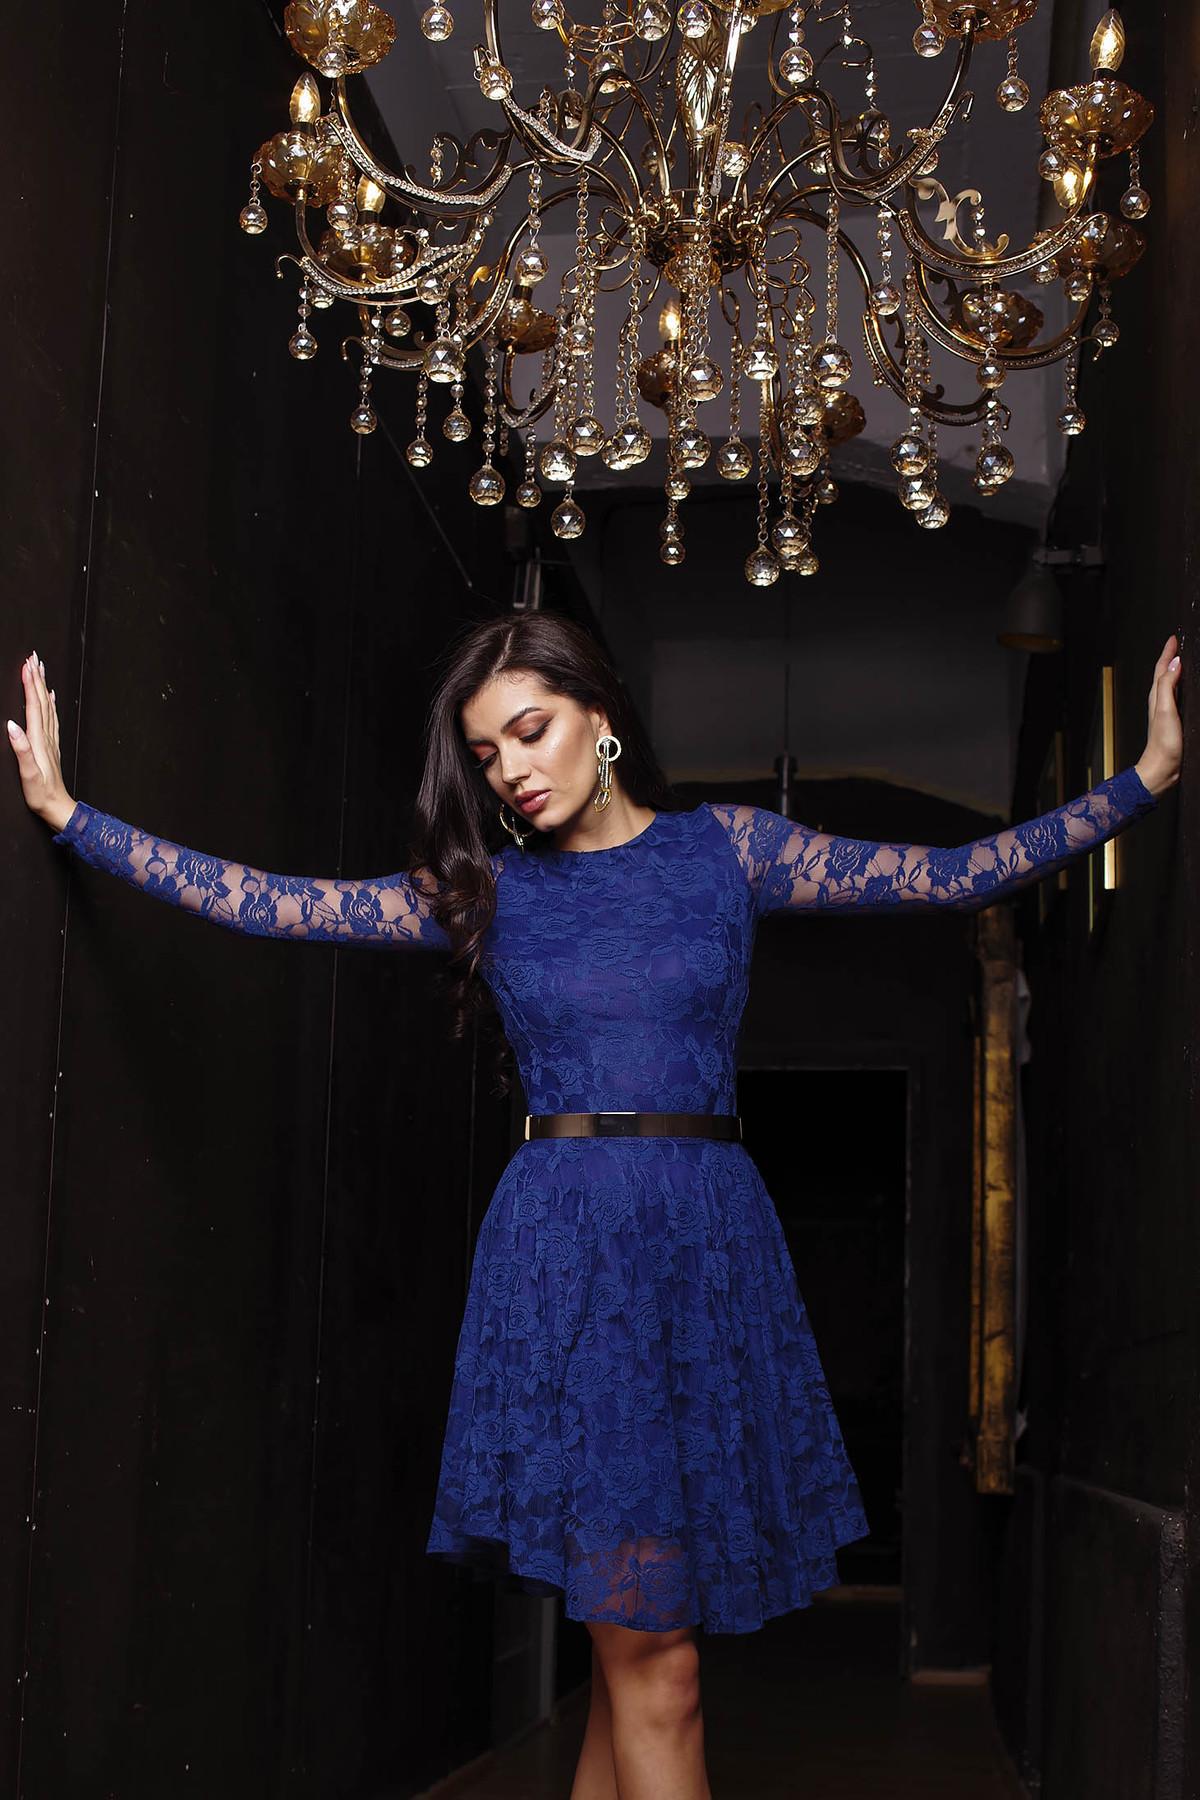 Rochie Artista albastru-inchis de ocazie in clos din dantela elastica captusita pe interior cu maneci lungi